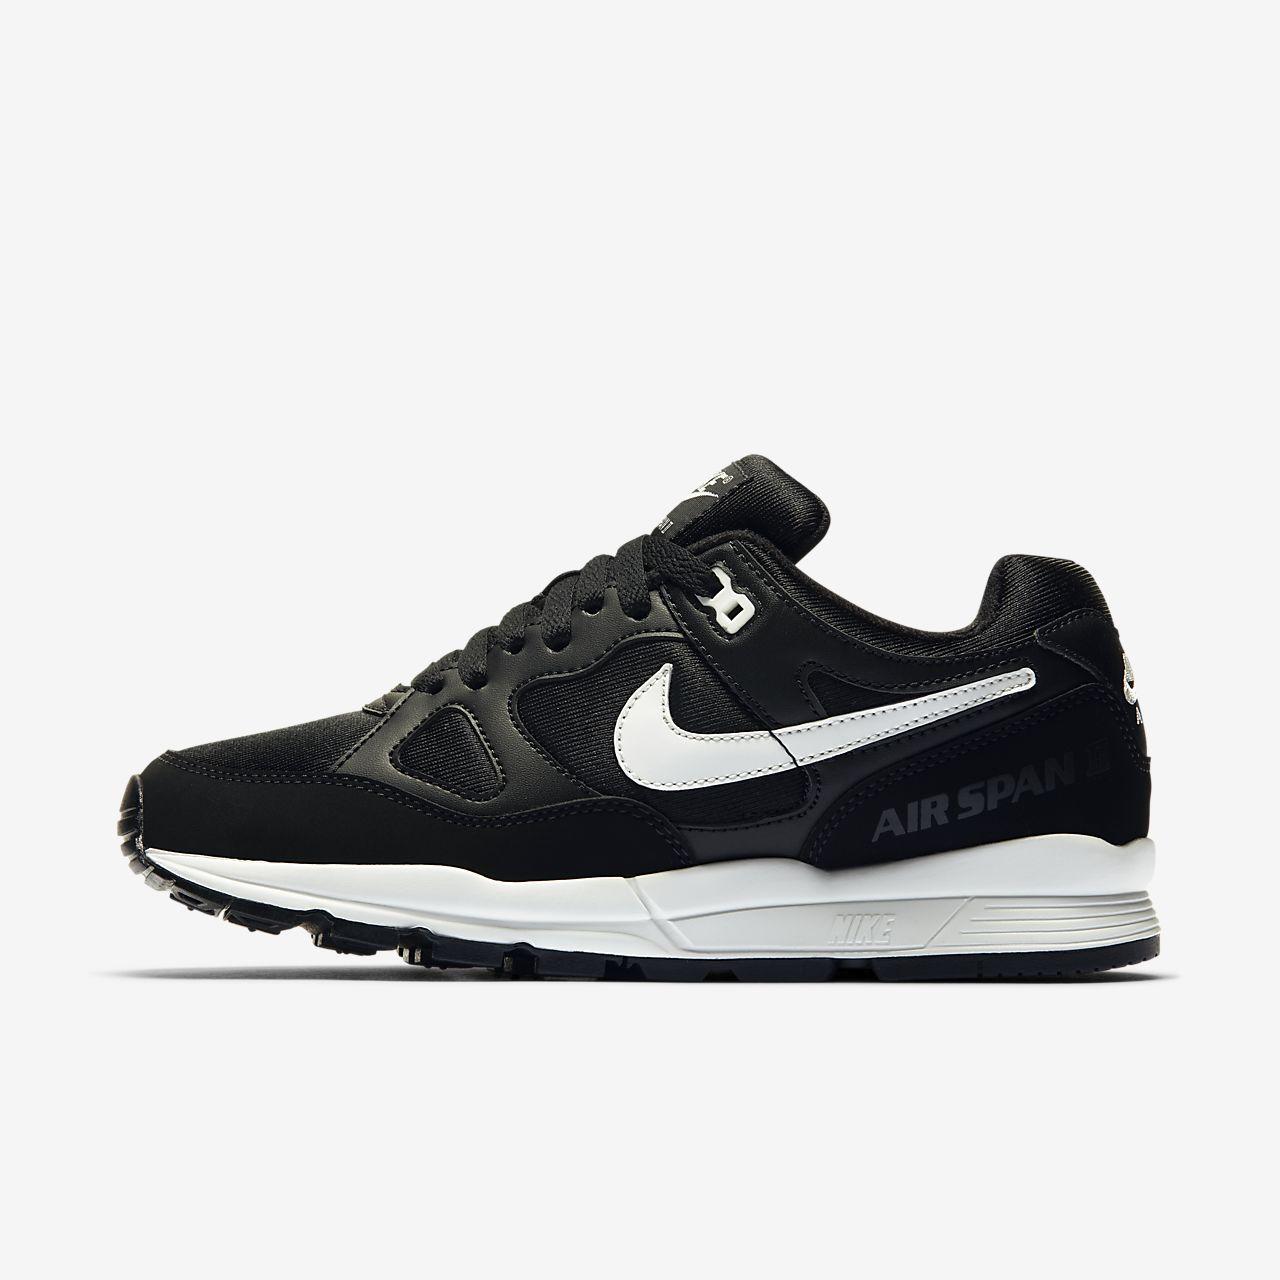 reputable site 6f768 0c4cd ... Nike Air Span II - sko til kvinder